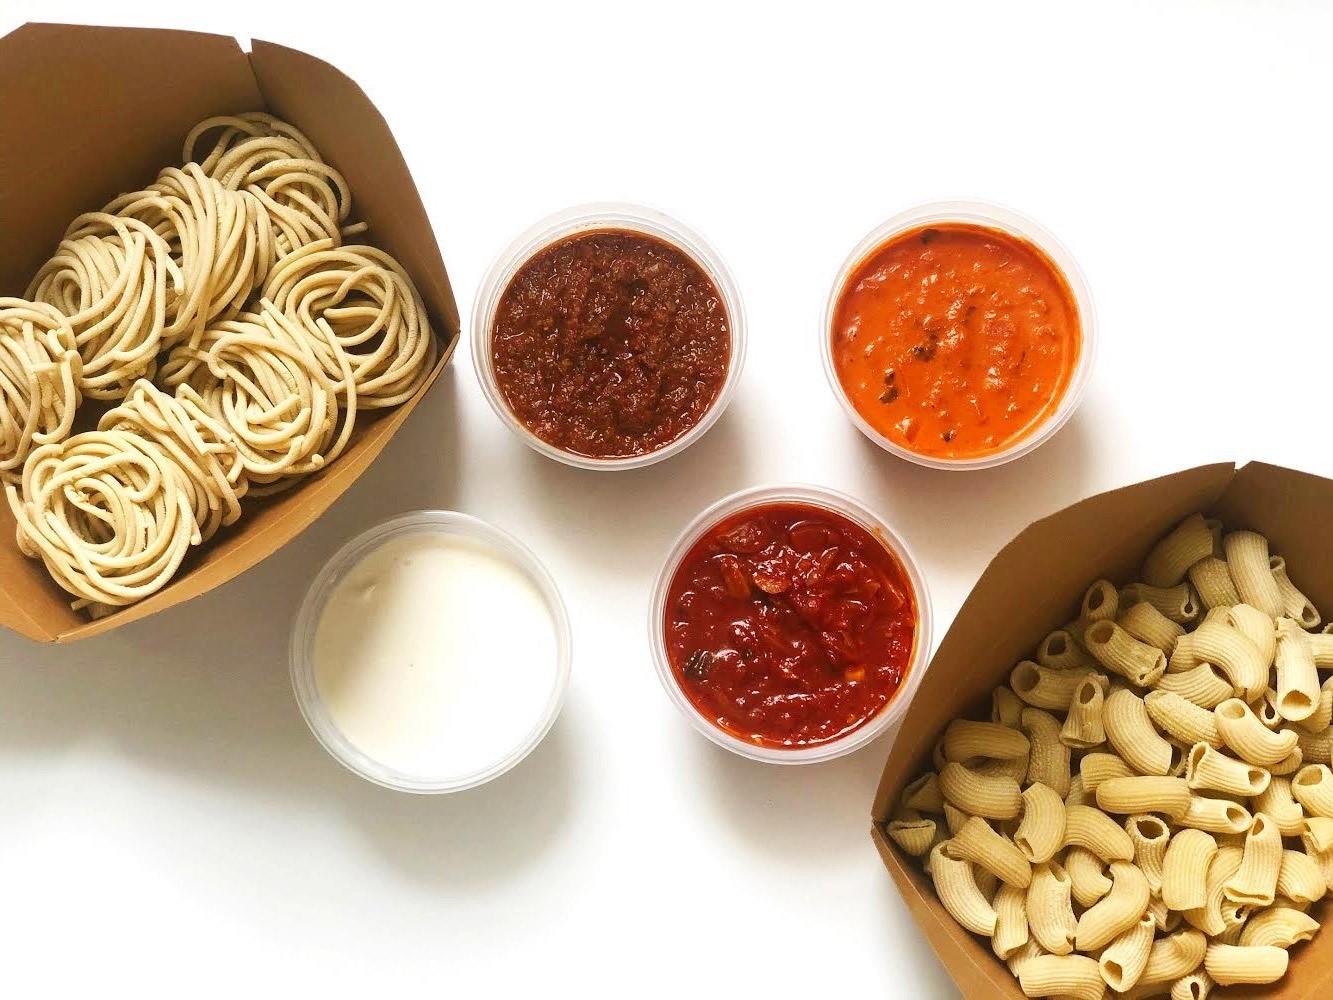 pasta peddler, pasta, ryan poli, noodles, sauce, italian, meal kit